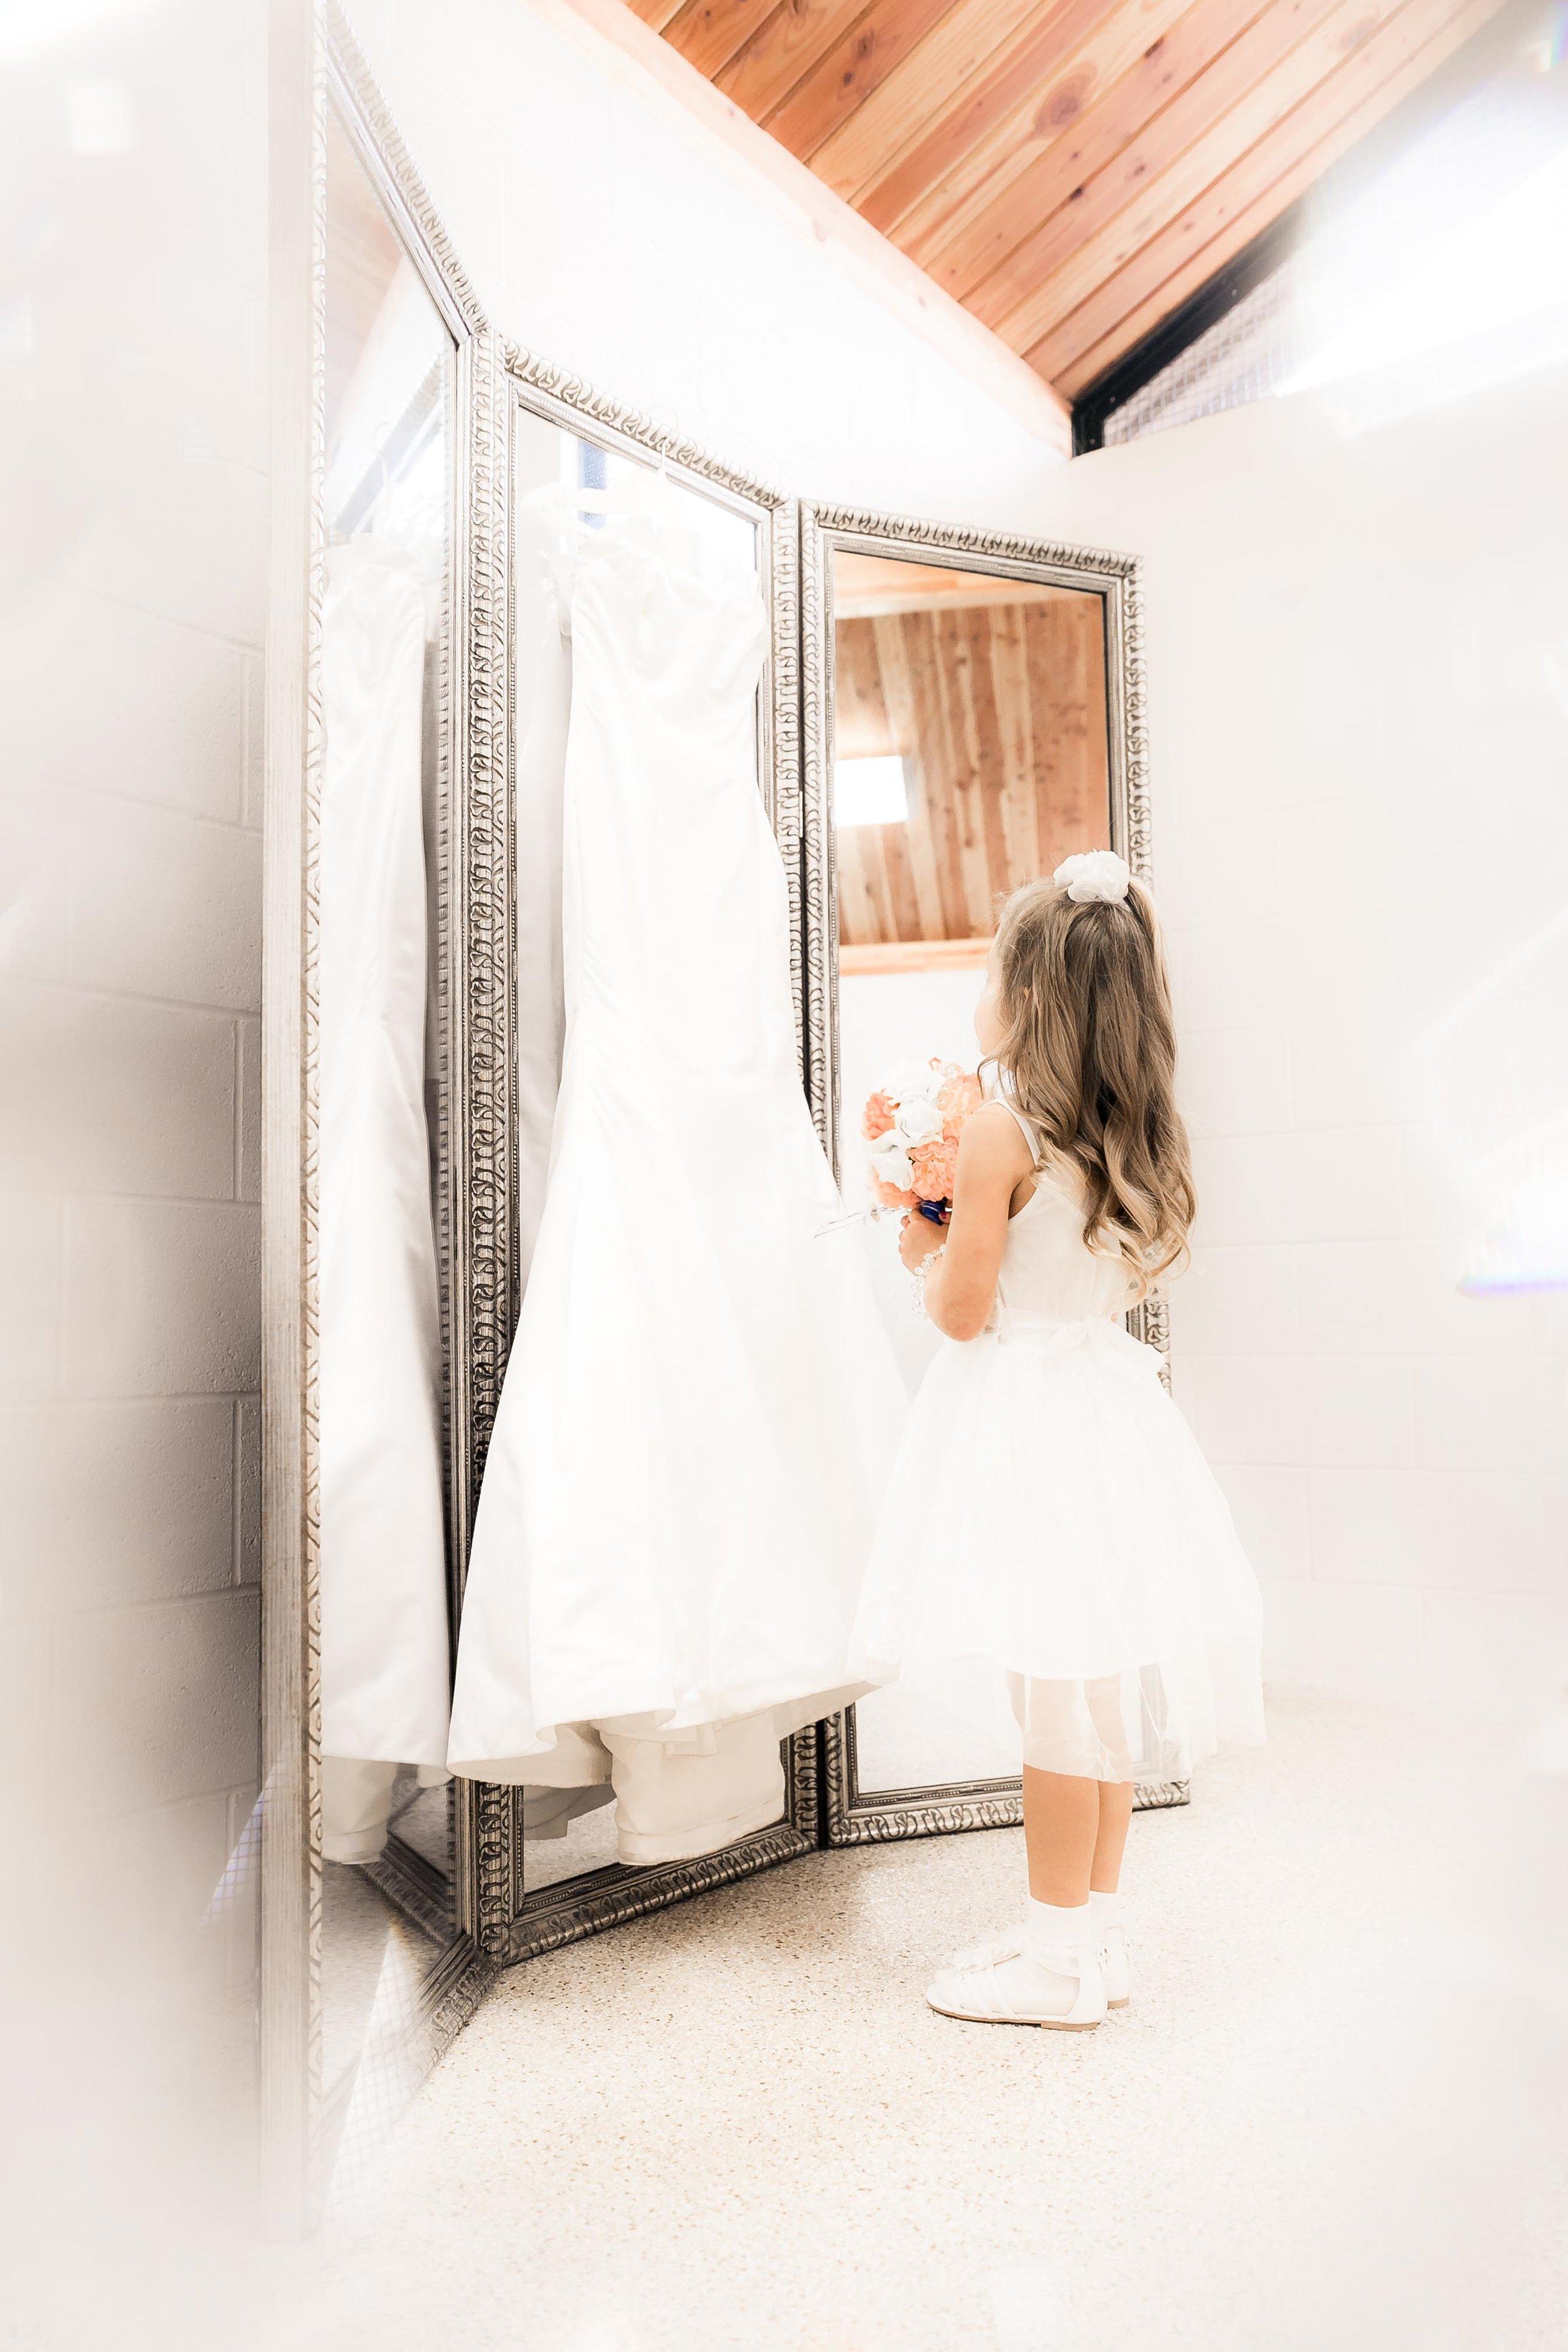 southern_california_wedding_joshuachun_photography_portraits-4.JPG